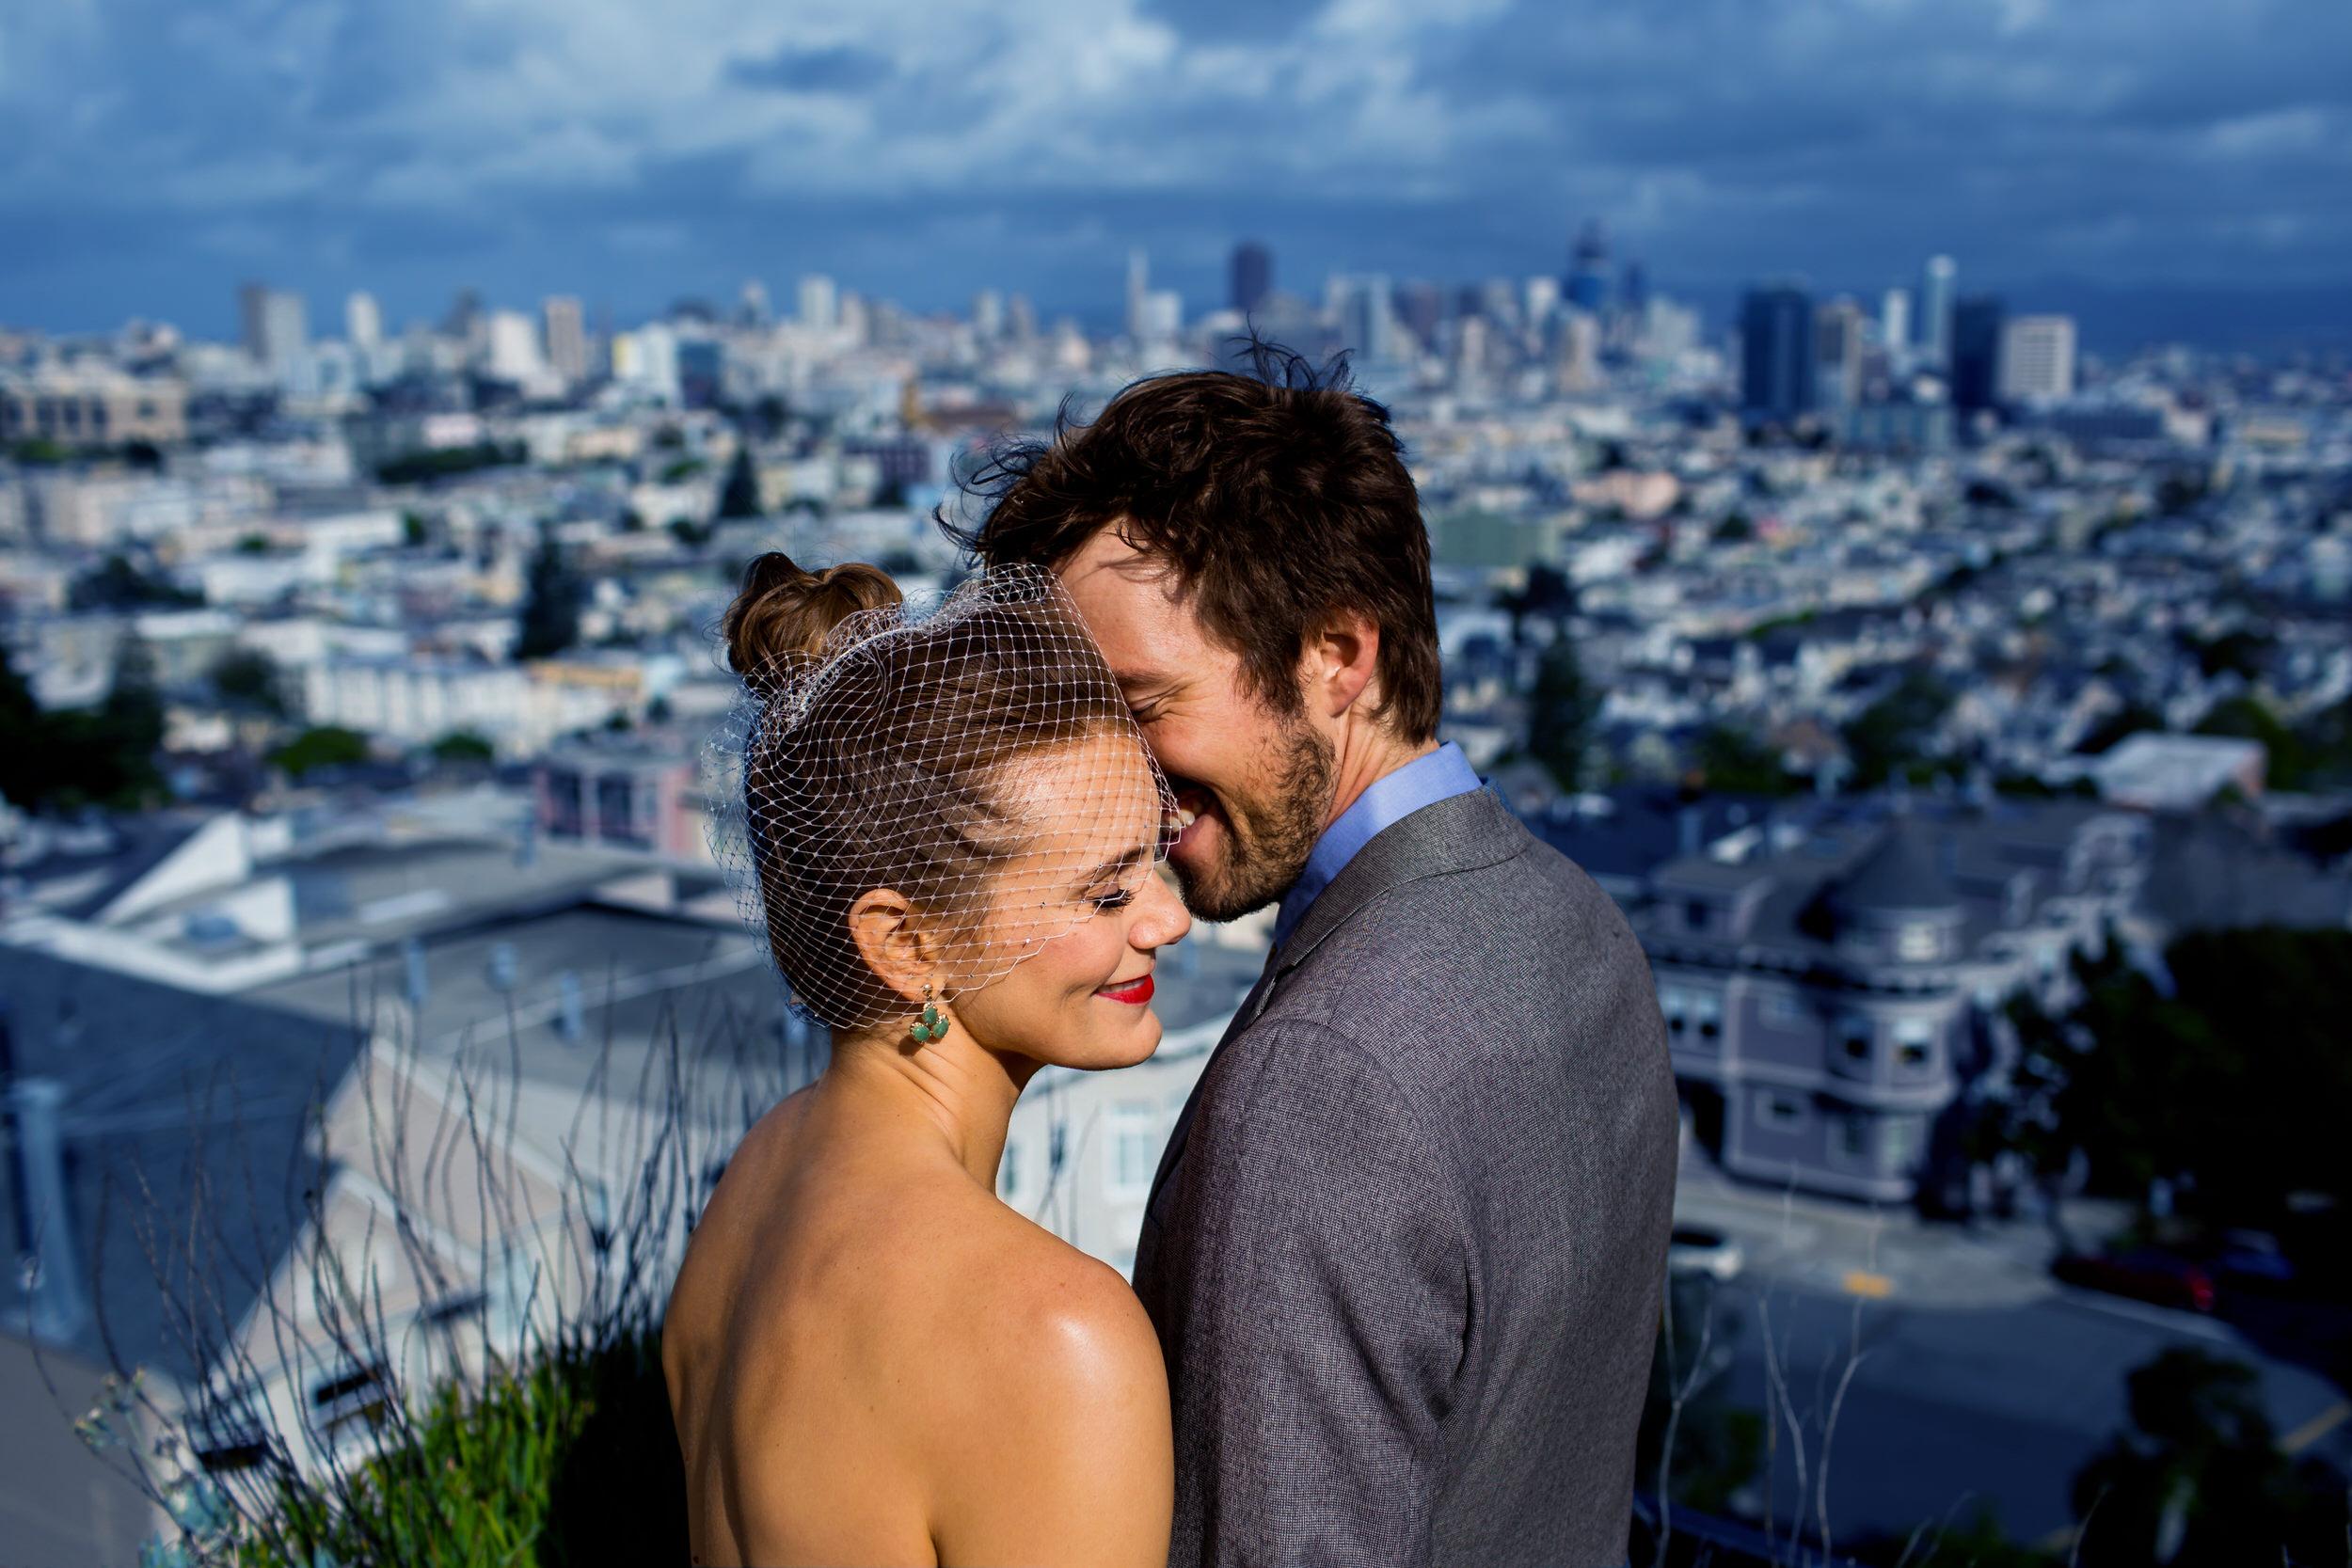 the_pearl_san_francisco_wedding_049.jpg